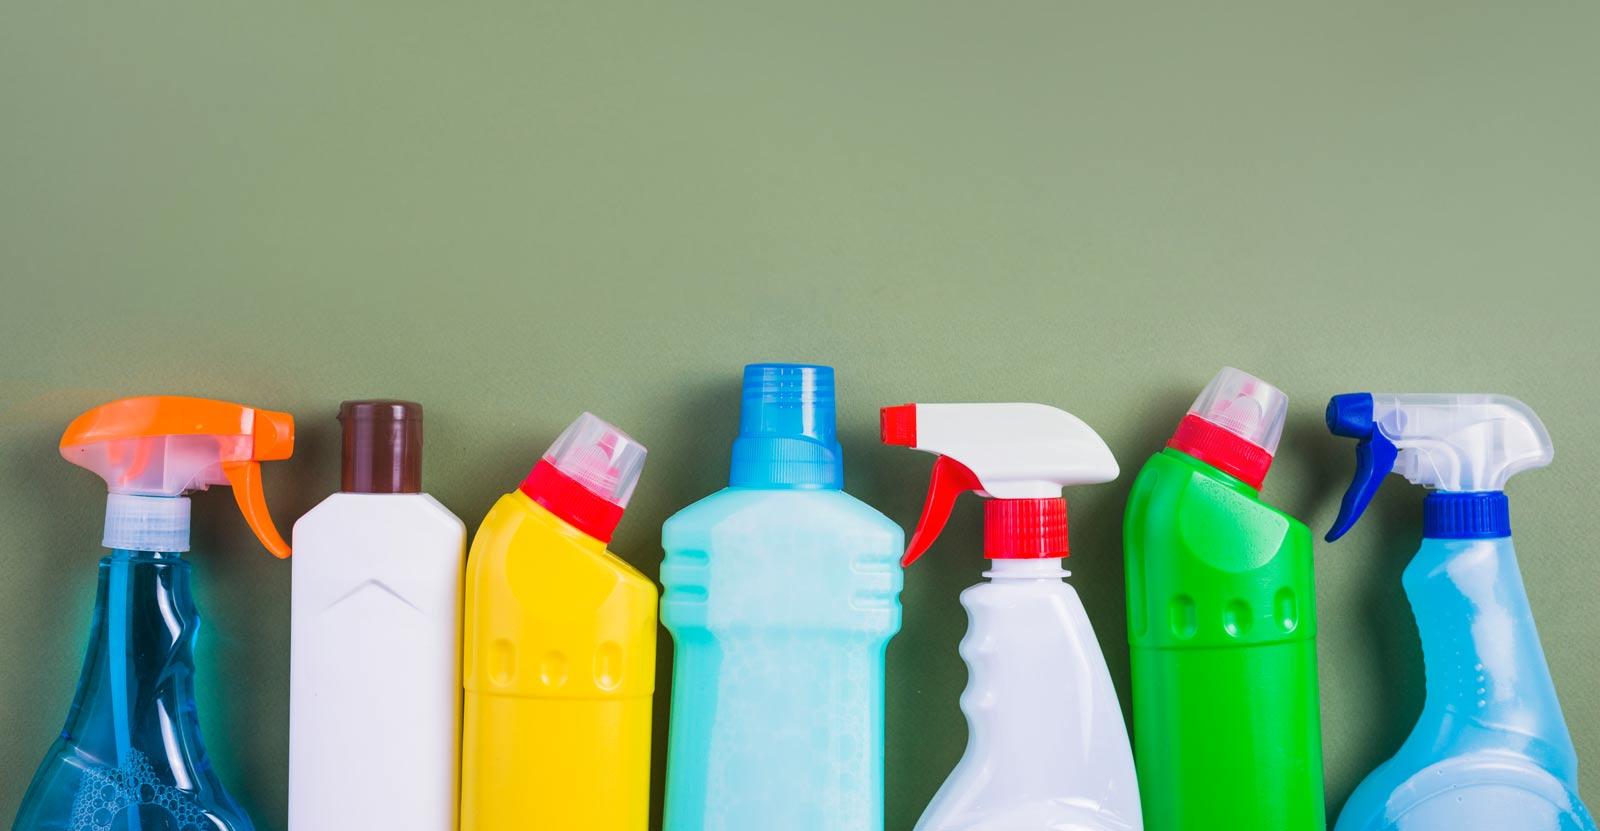 Materialschäden durch Desinfektionsmittel